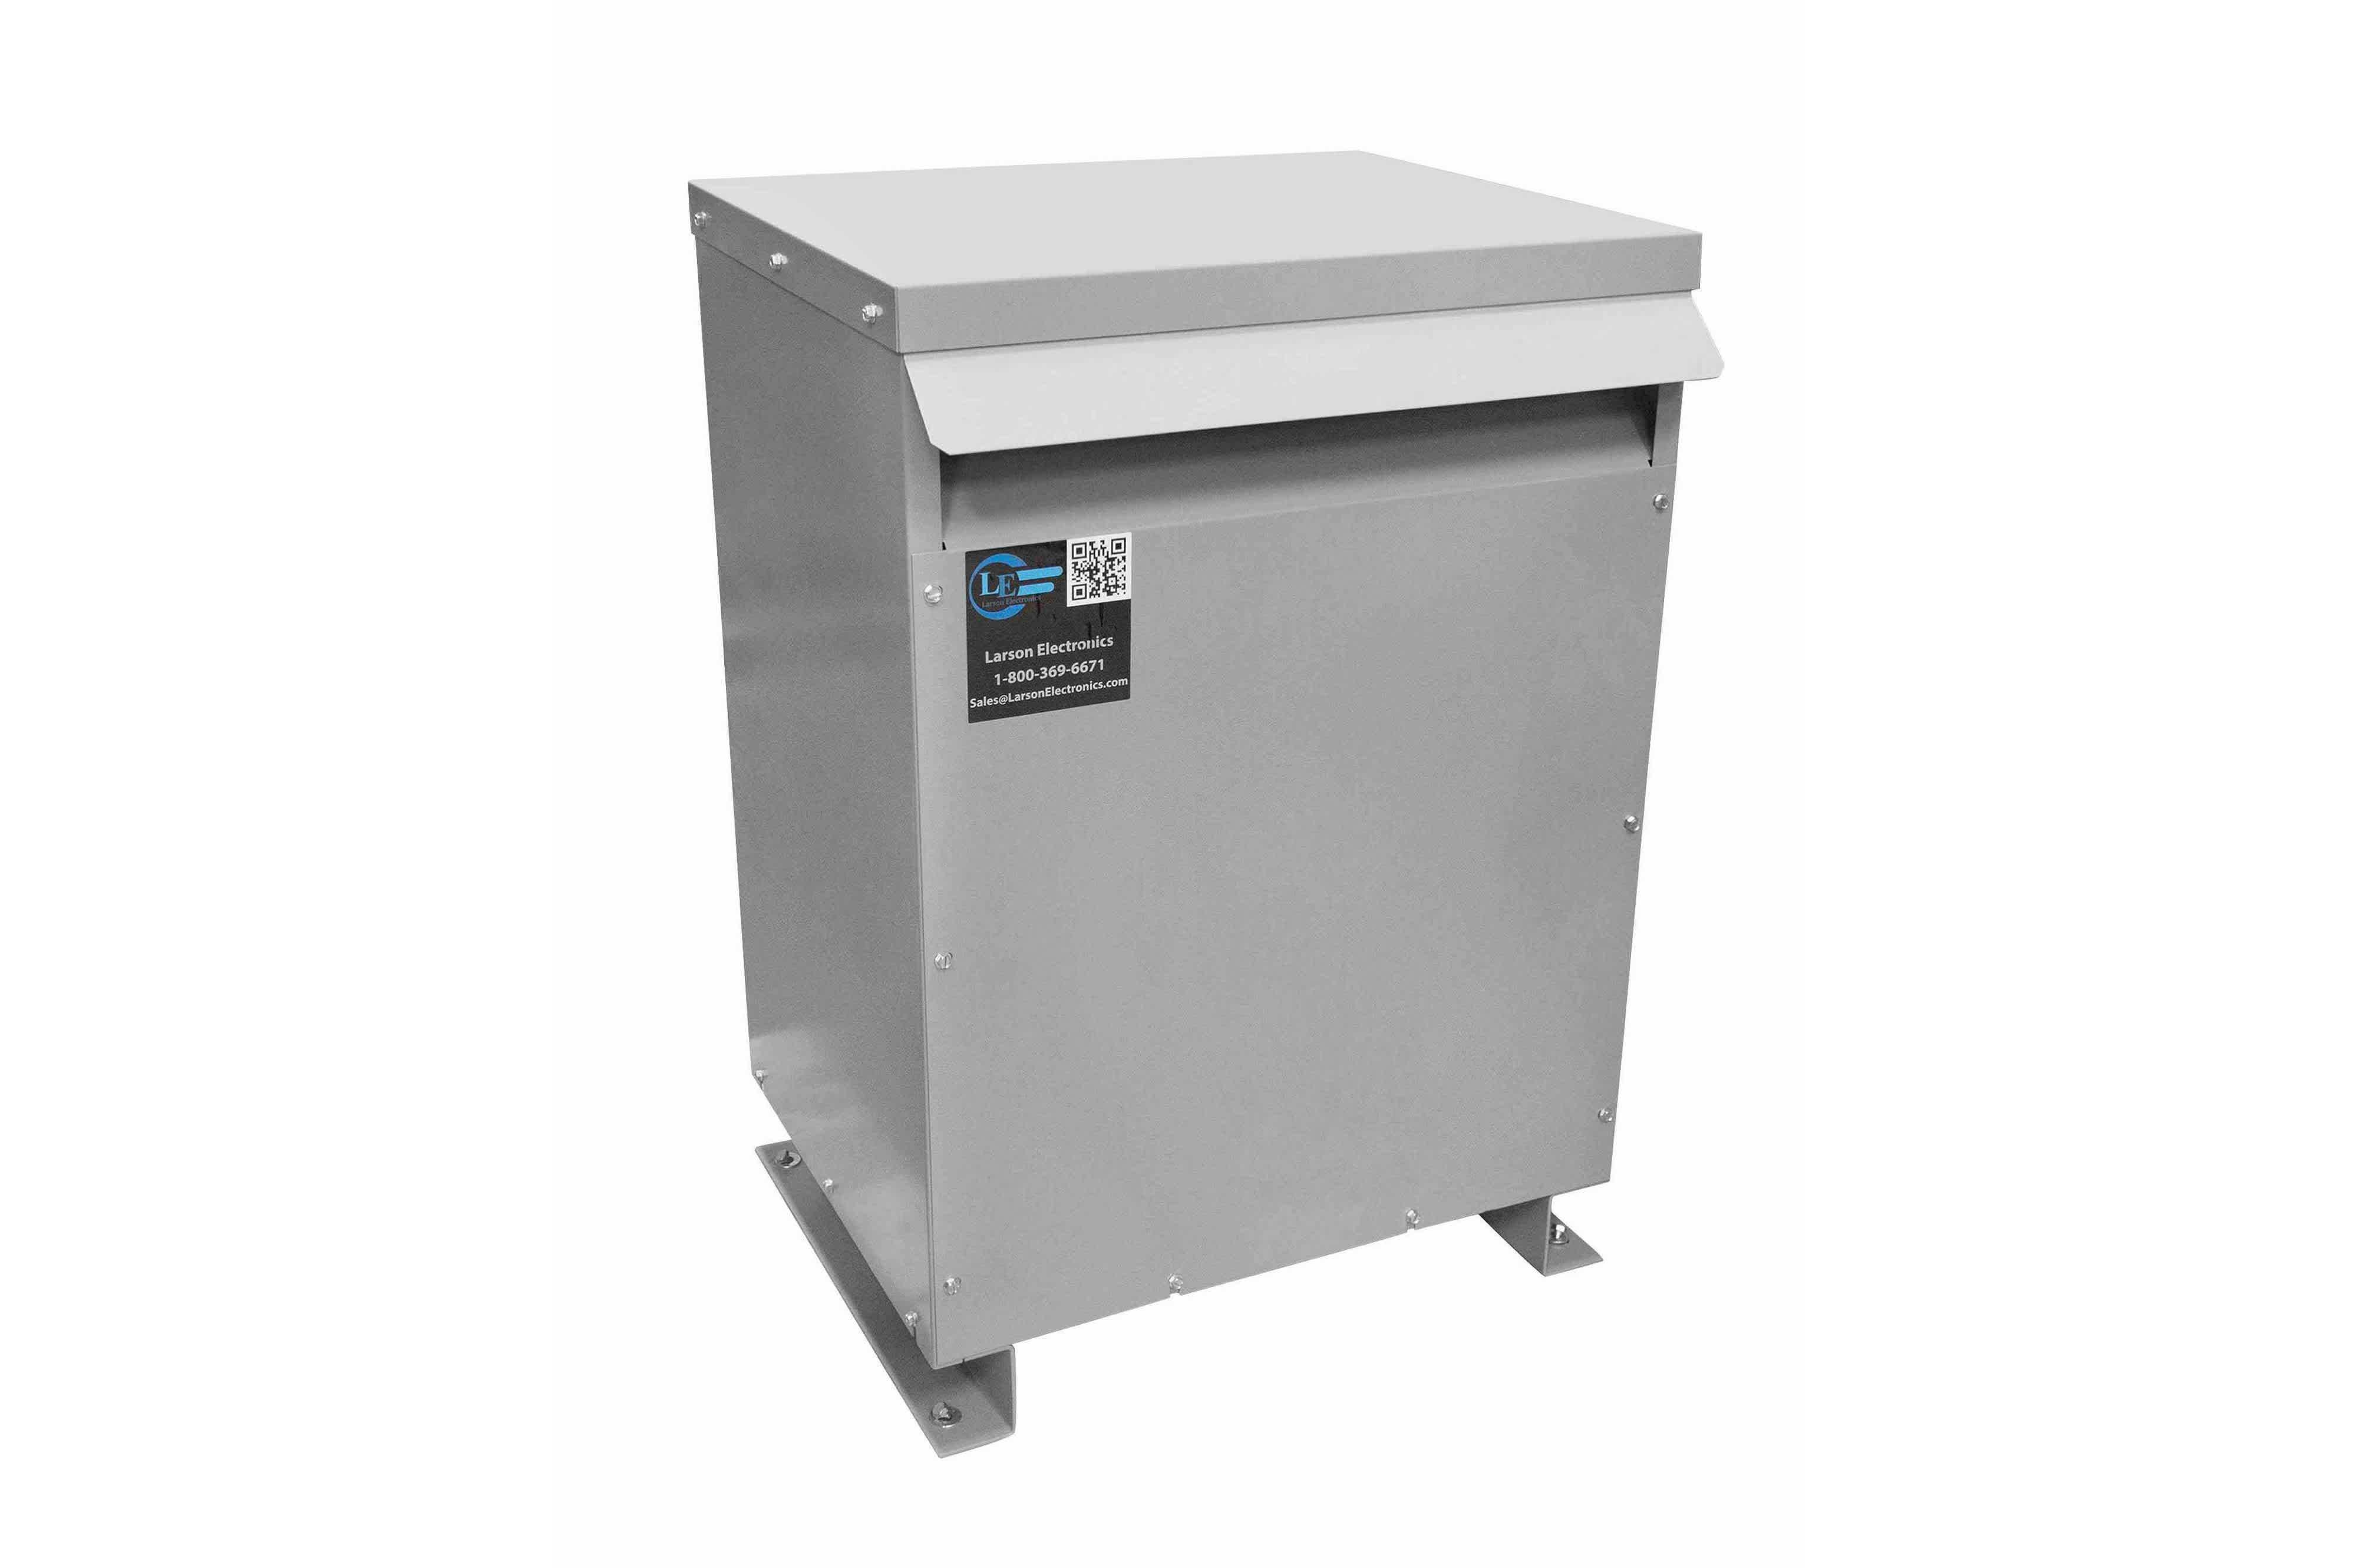 13 kVA 3PH Isolation Transformer, 380V Wye Primary, 480Y/277 Wye-N Secondary, N3R, Ventilated, 60 Hz